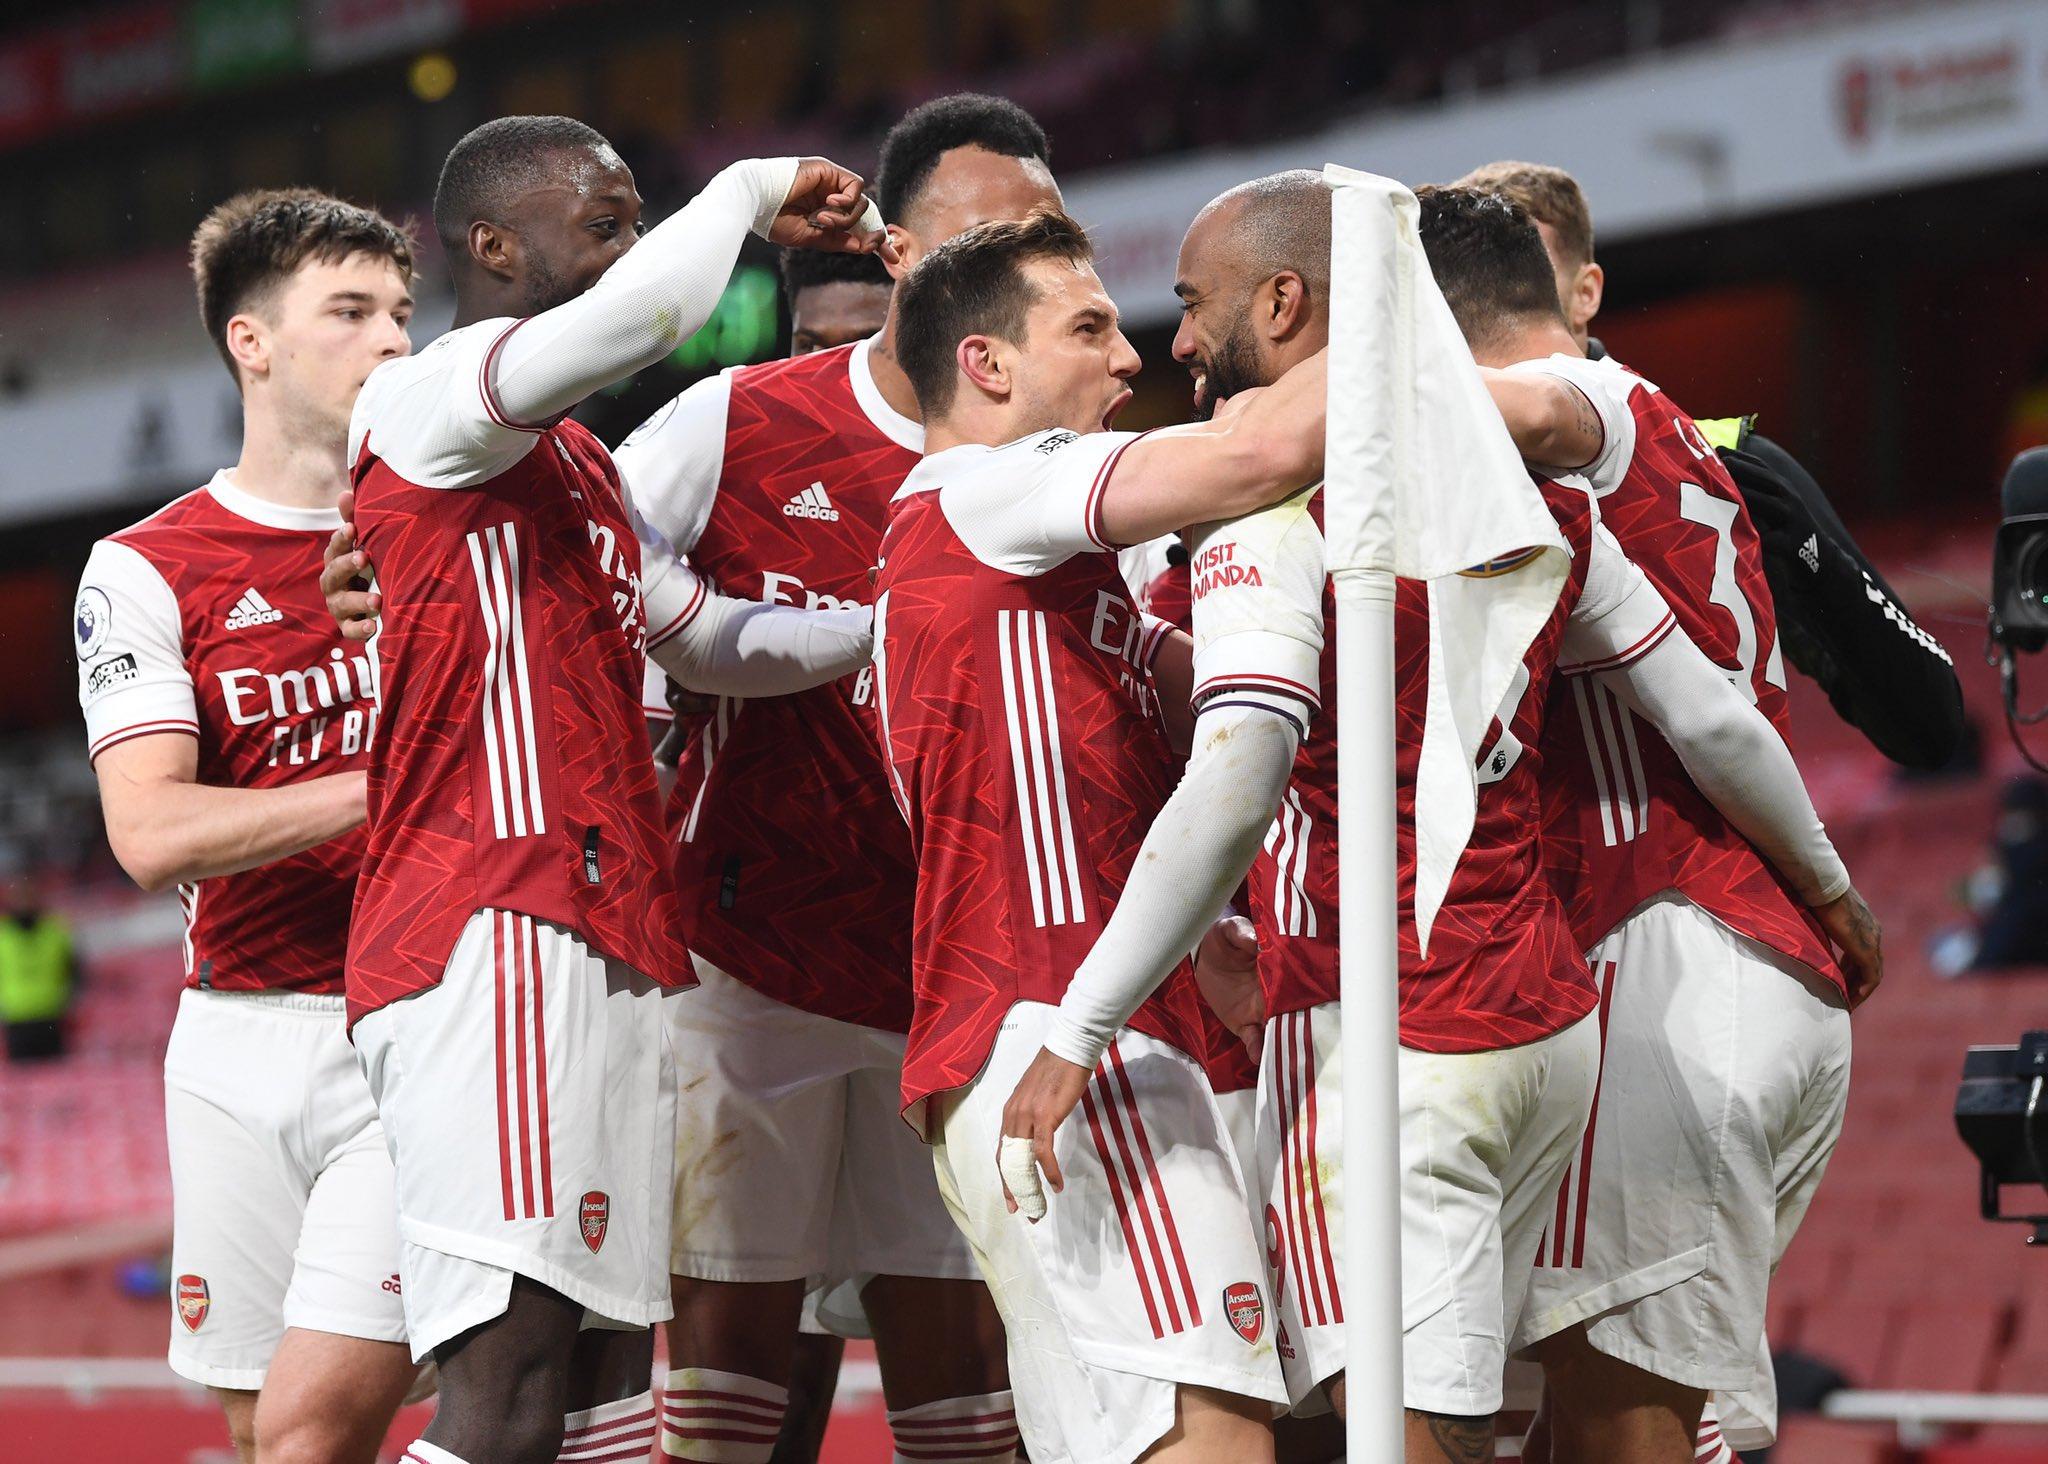 Alexander Lacazette for Arsenal [PHOTO CREDIT: @Arsenal]